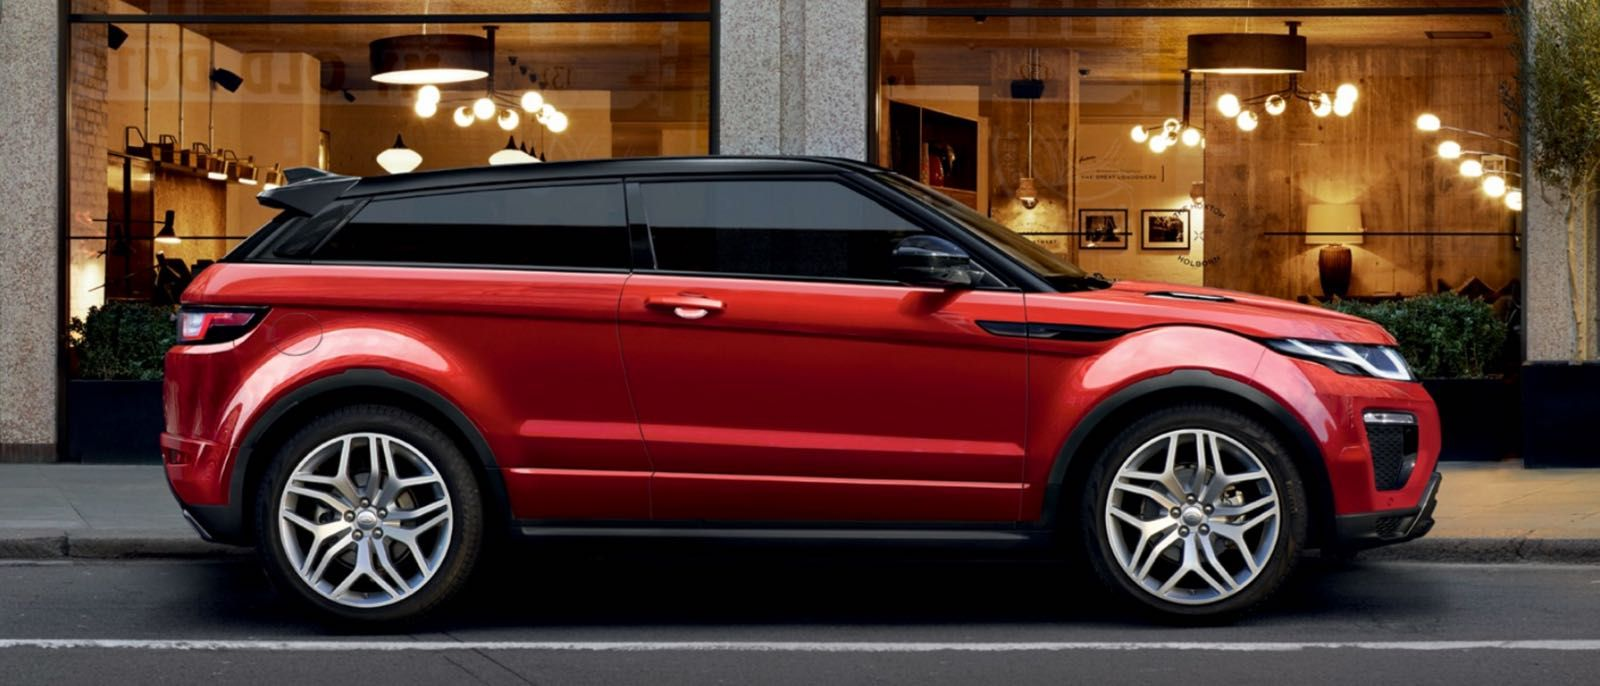 2016 Range Rover Evoque bright exterior Range rover